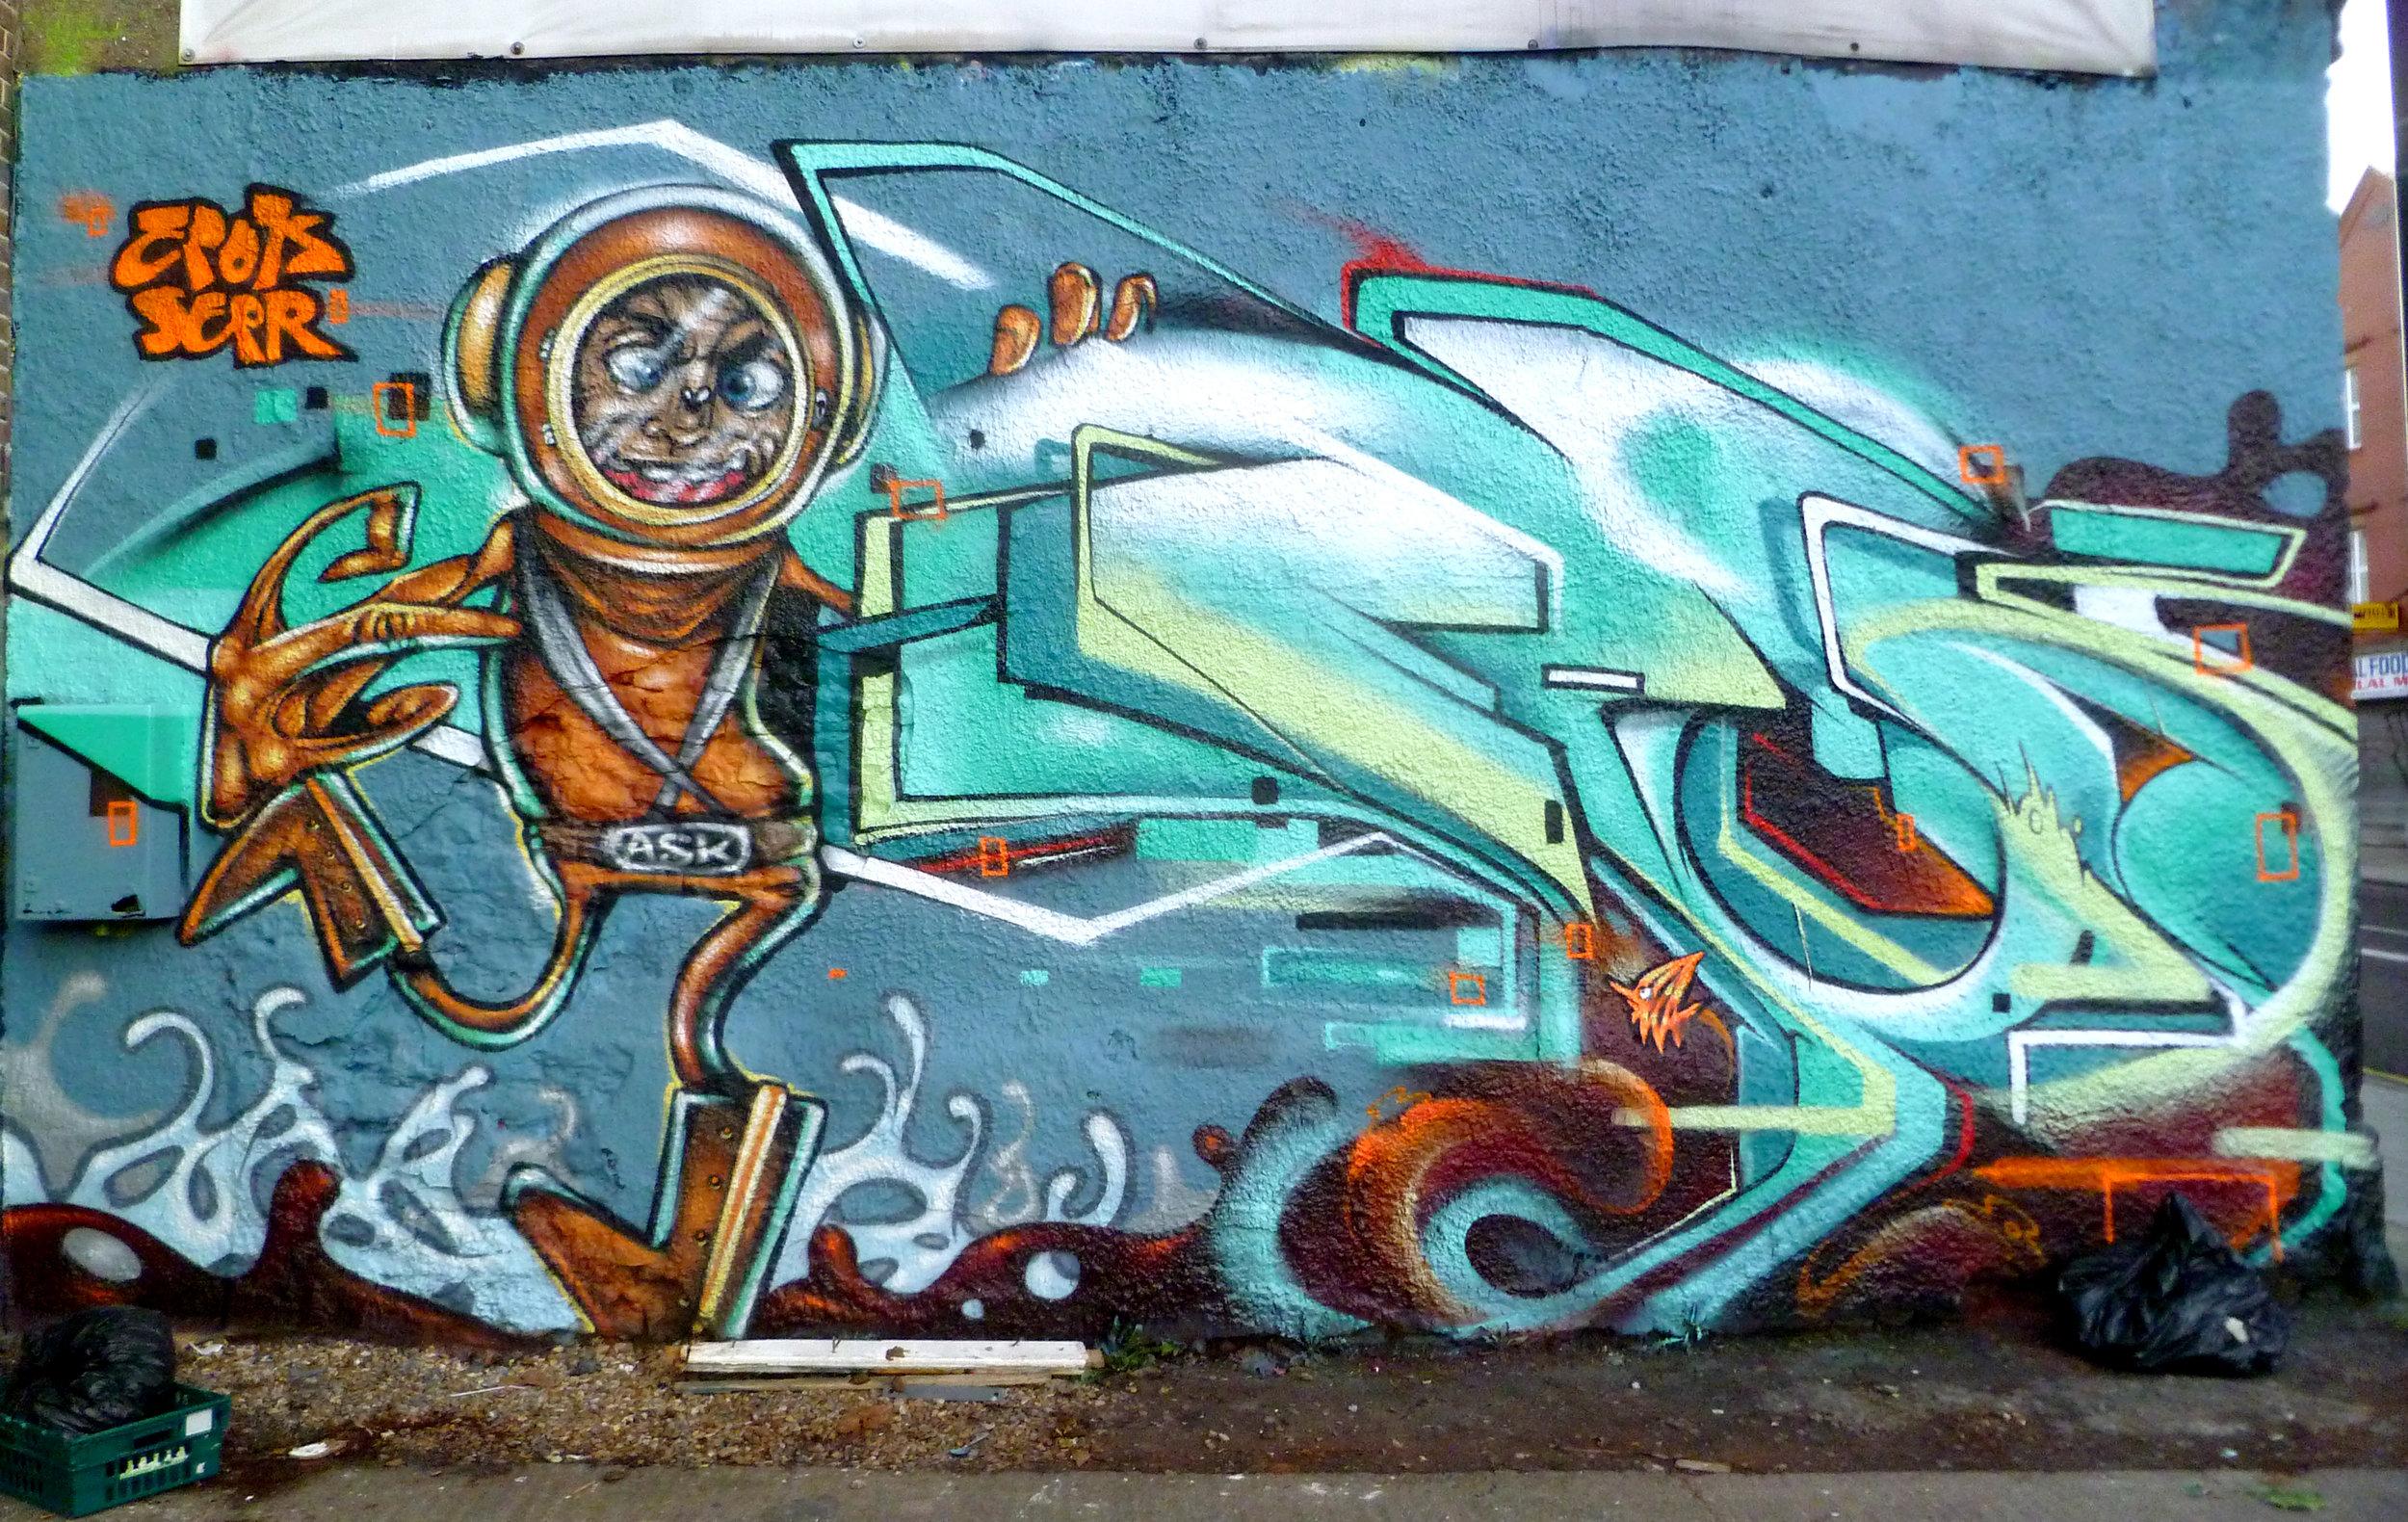 Bristol '12. With Epok